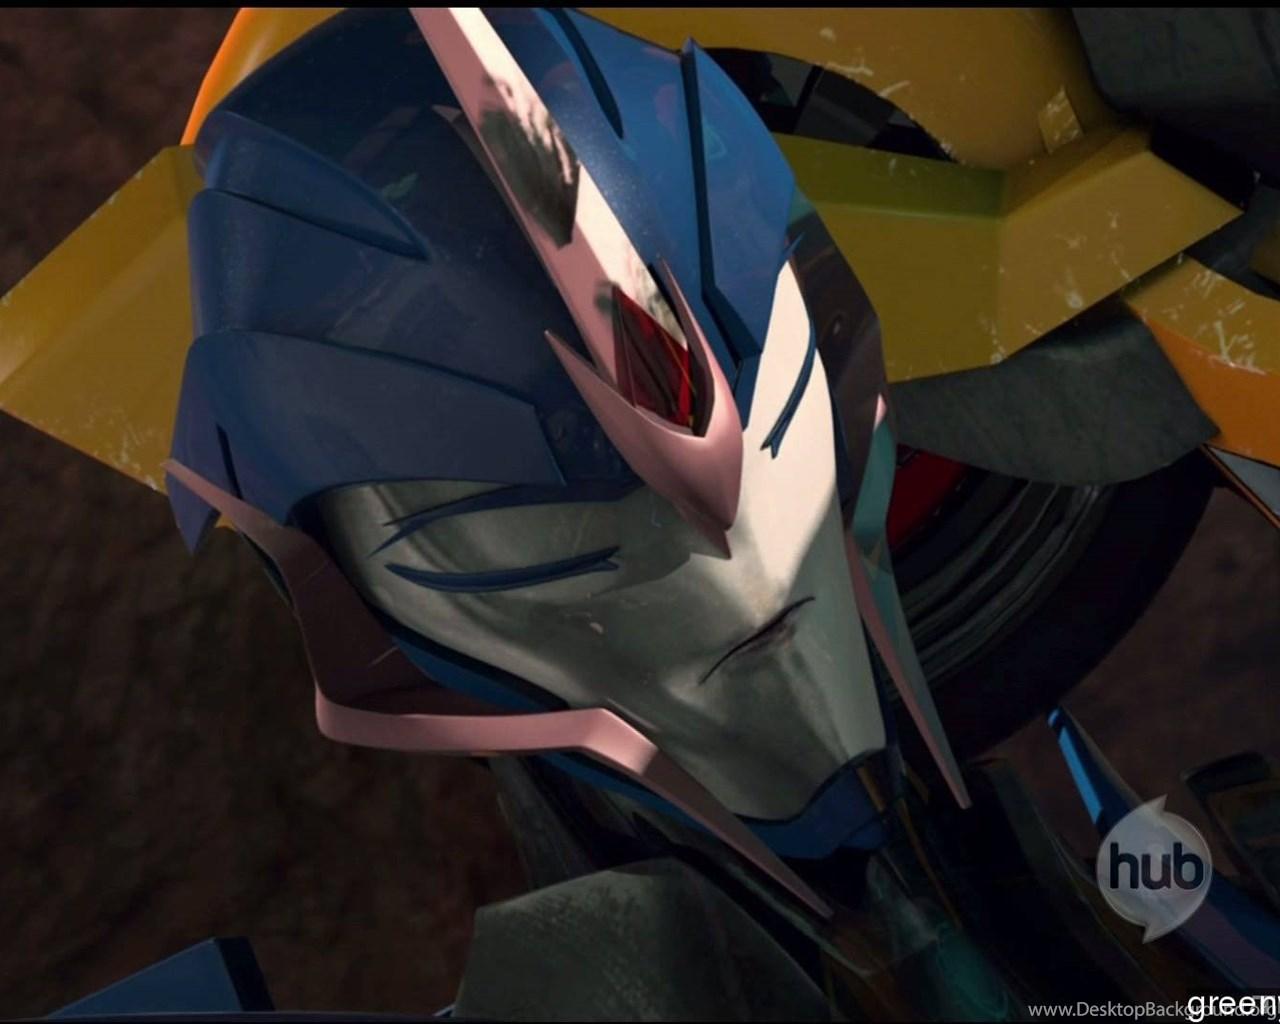 Transformers prime free download episodes.